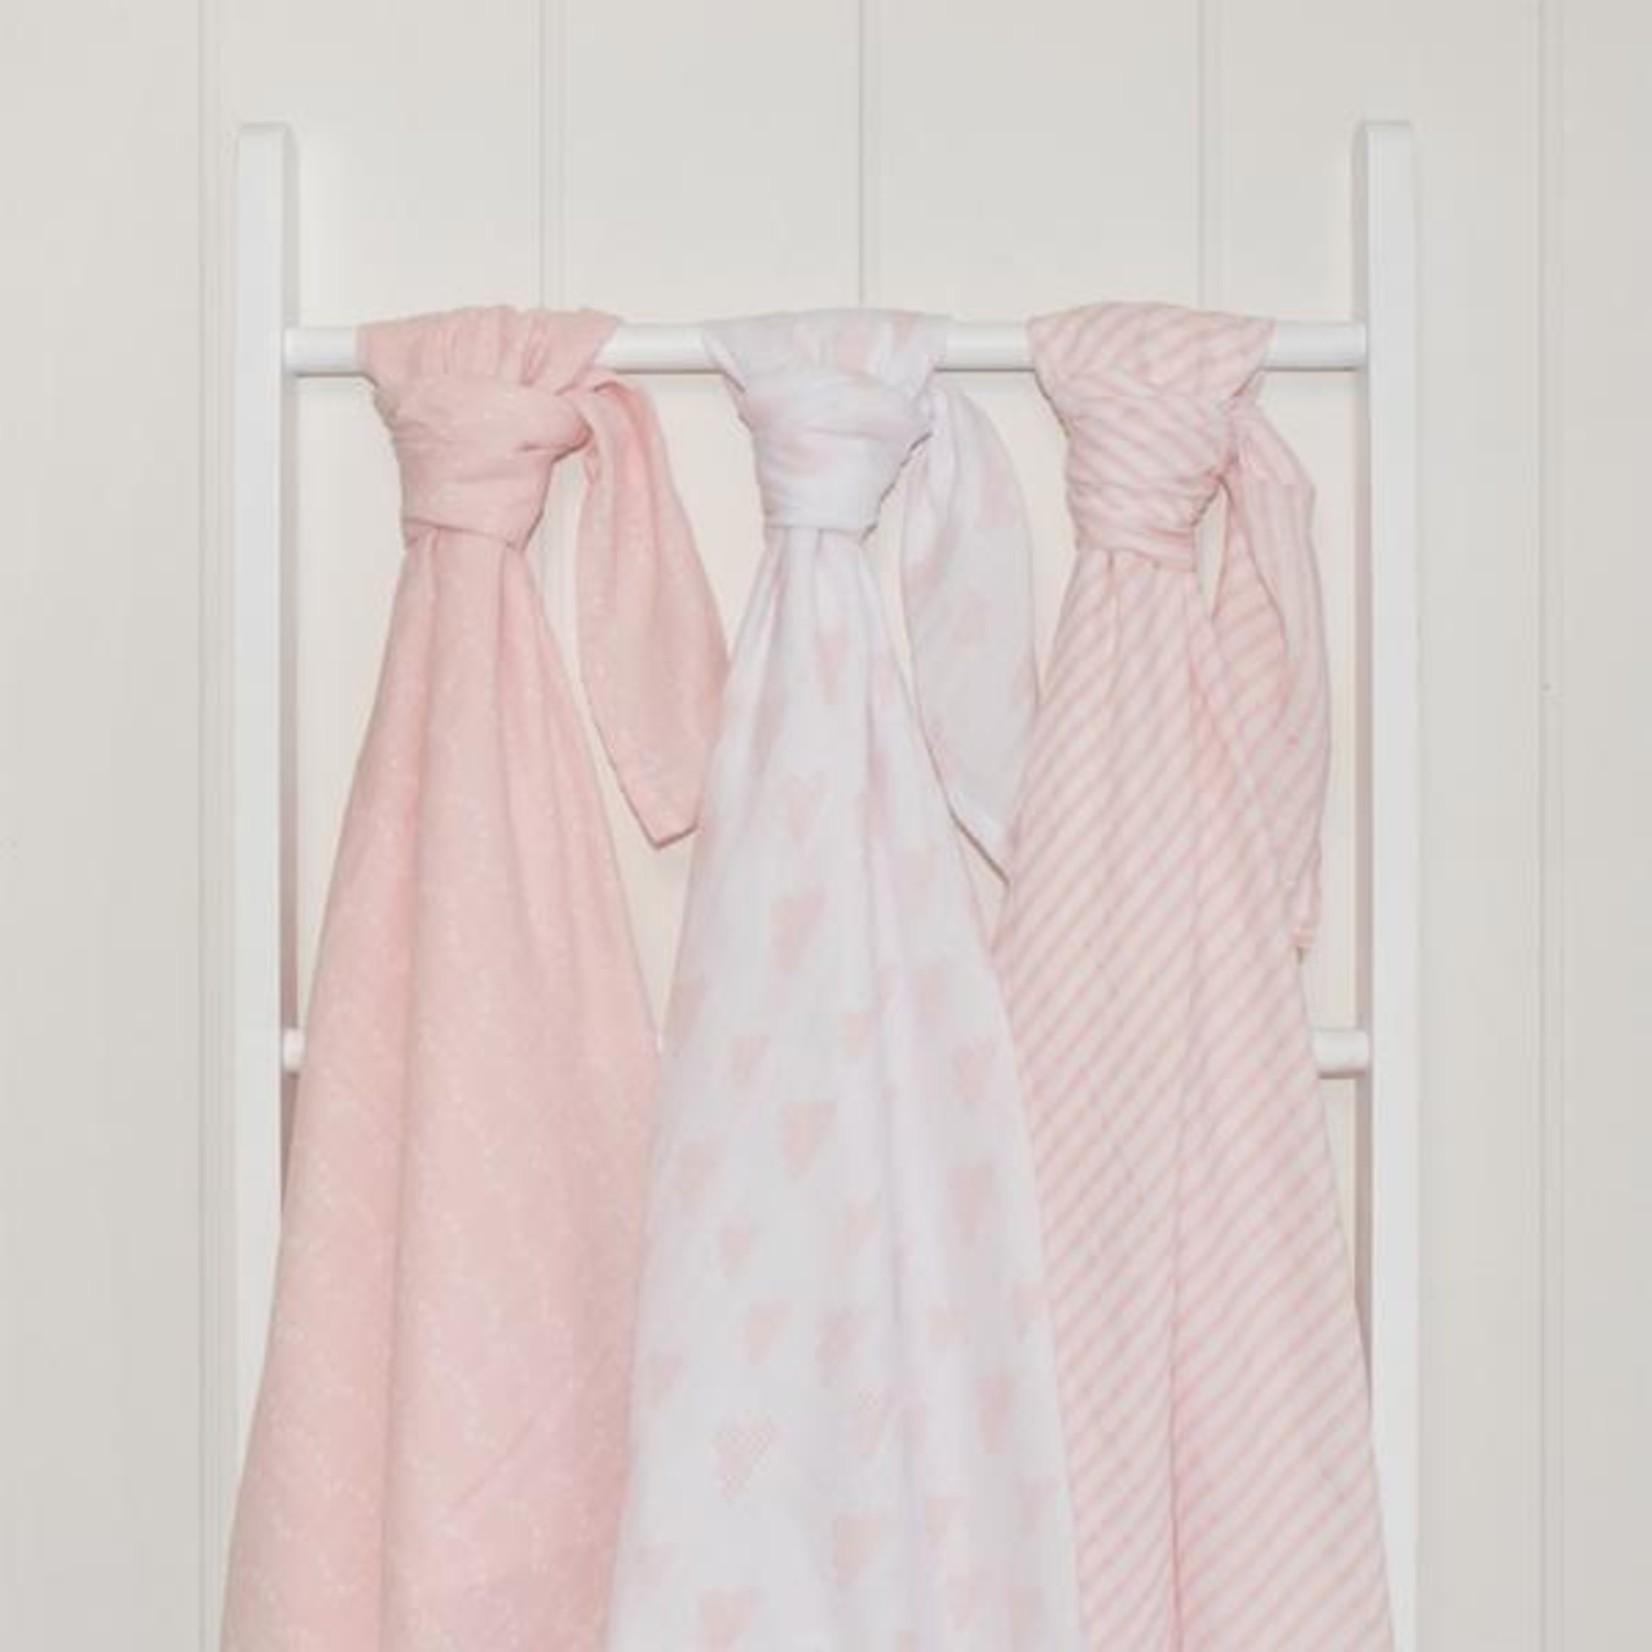 Living Textiles Living Textiles Muslin Wraps 3 Pack